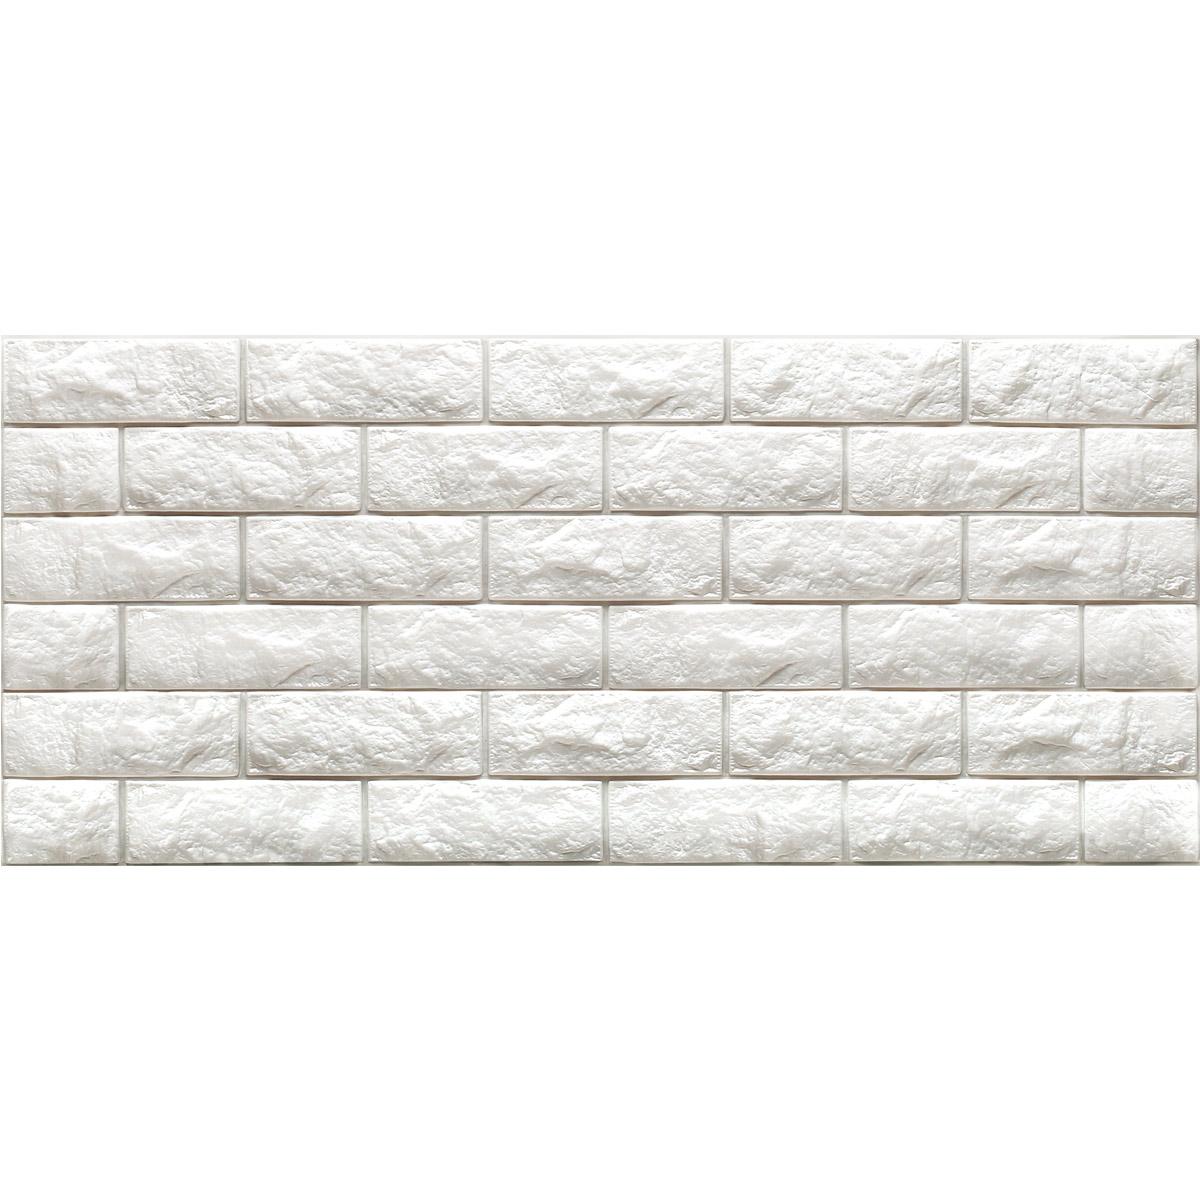 L Stick Wall Panels Foam Block Brick Design 10 Pics 48 4 Sq Ft